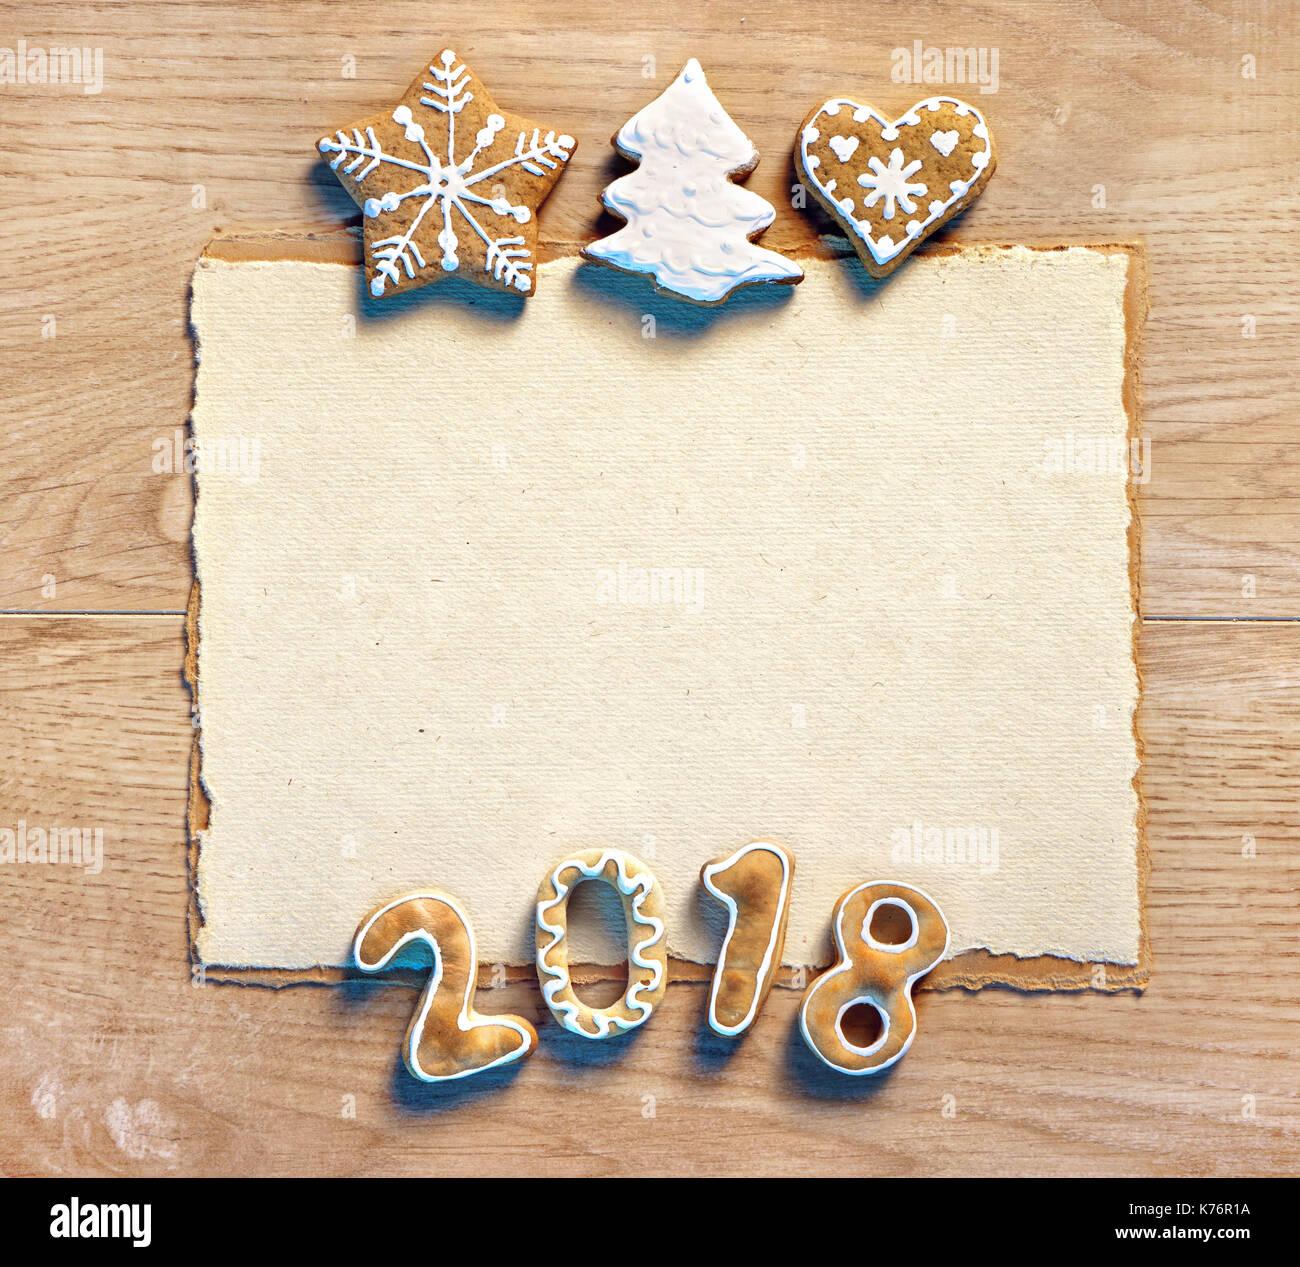 weihnachtsbrief mit lebkuchen cookies 2018 frohe. Black Bedroom Furniture Sets. Home Design Ideas